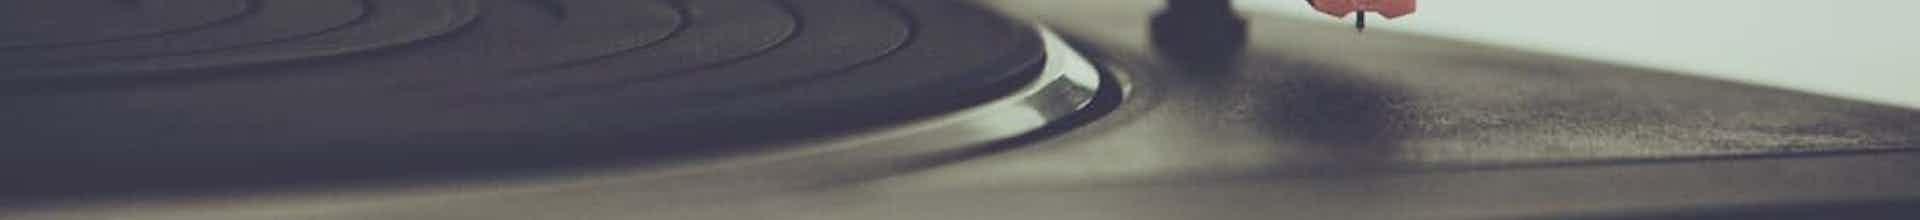 vinyl-dj_0